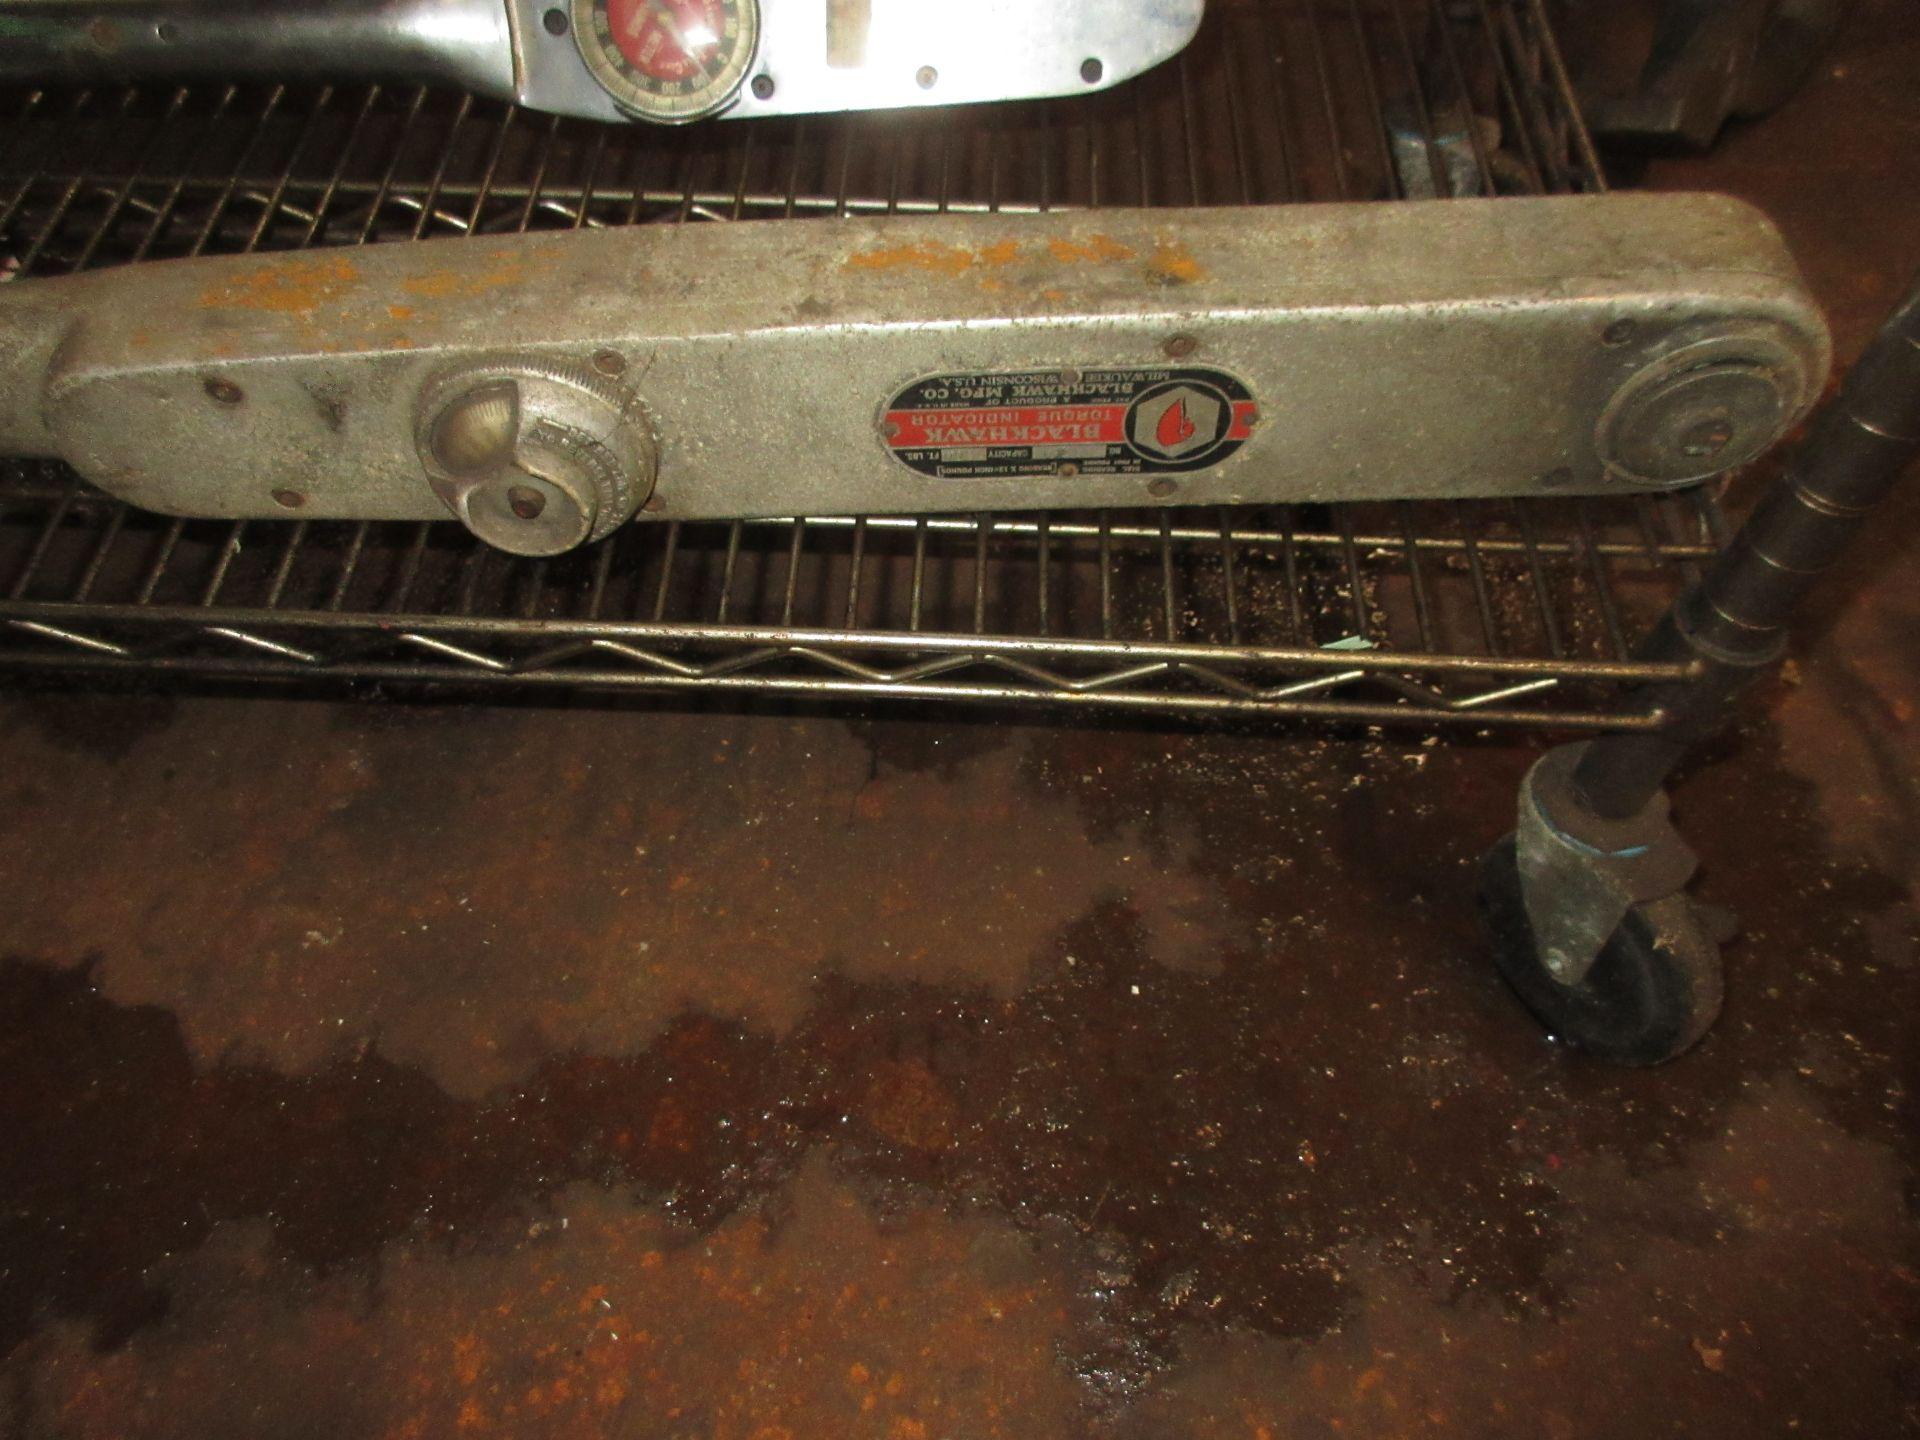 (1) Blackhawk 89959 Socket Wrench